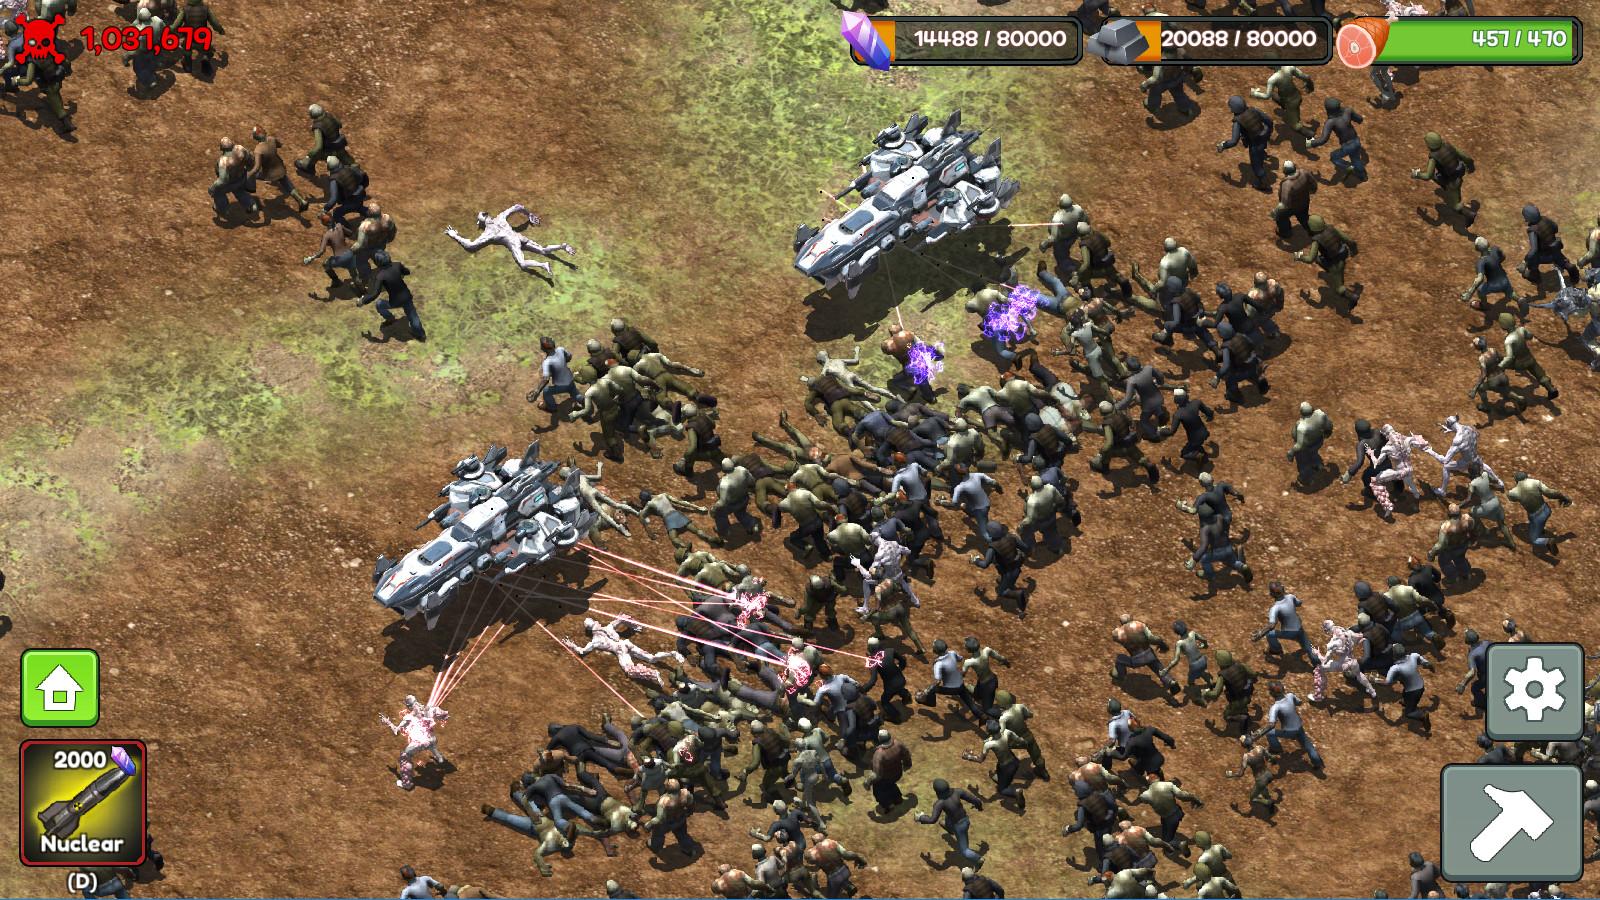 RTS+塔防的《僵尸潮:灭绝》,数不清的僵尸要打,根本停不下来